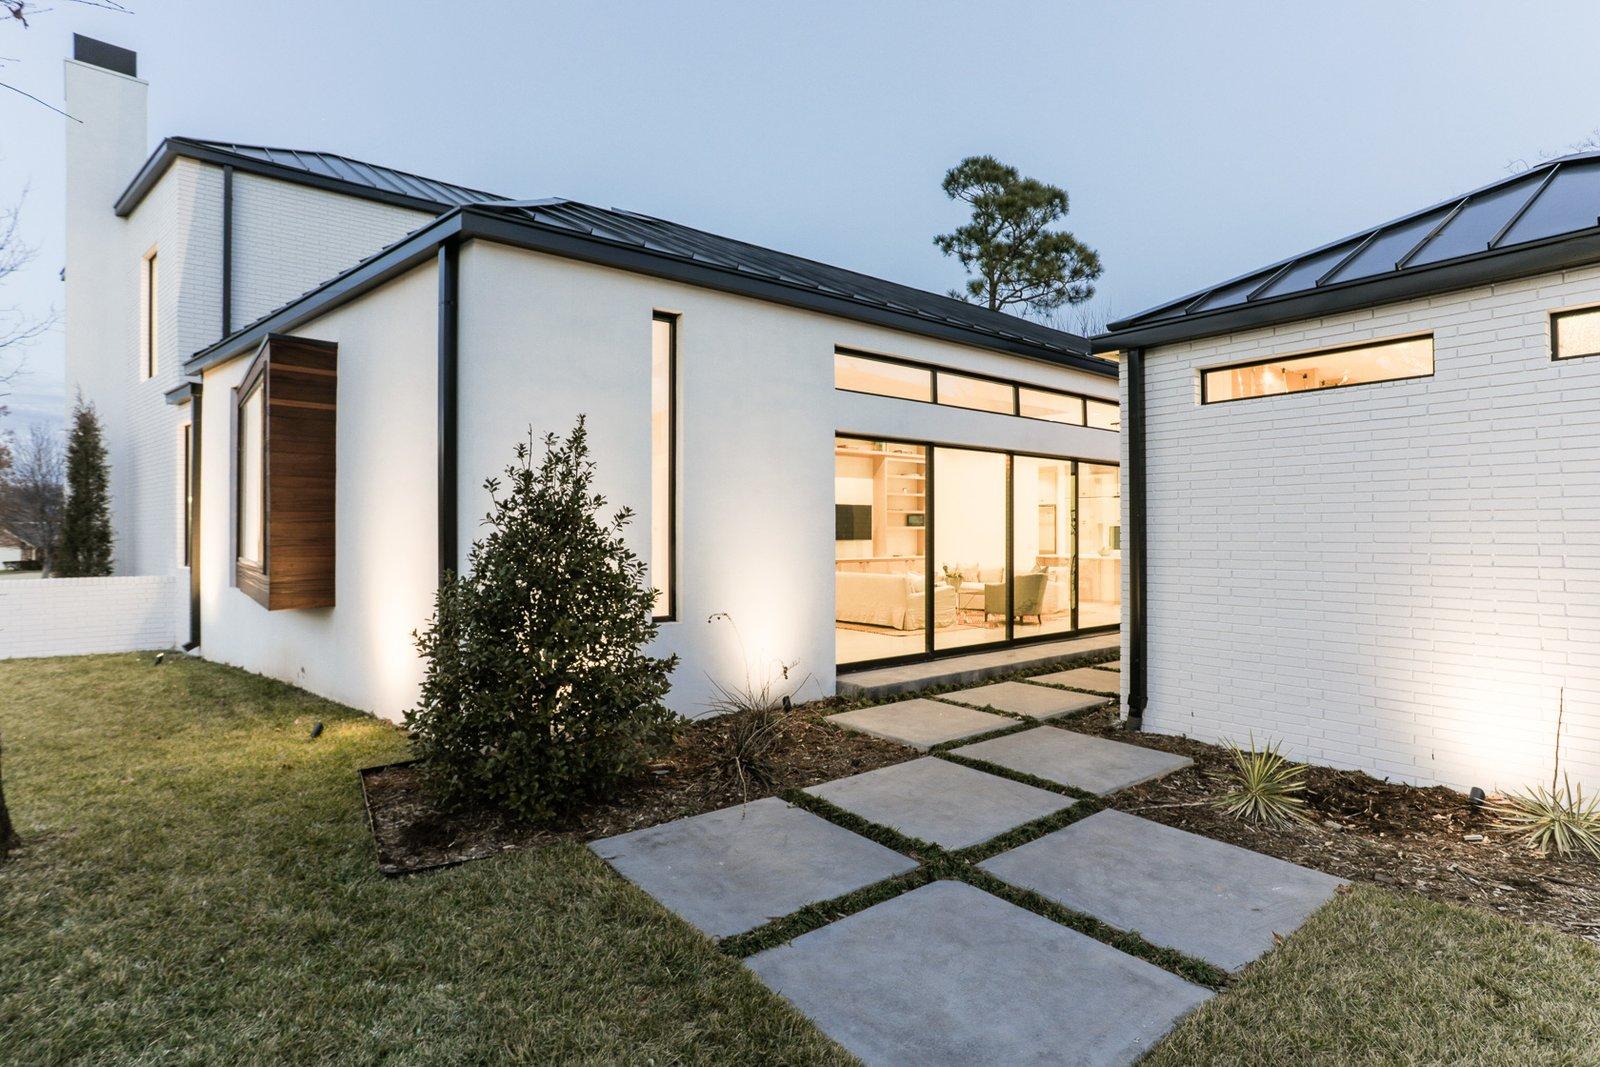 Exterior, House, Stucco, Brick, and Metal  Exterior Stucco Brick Photos from OKC Modern